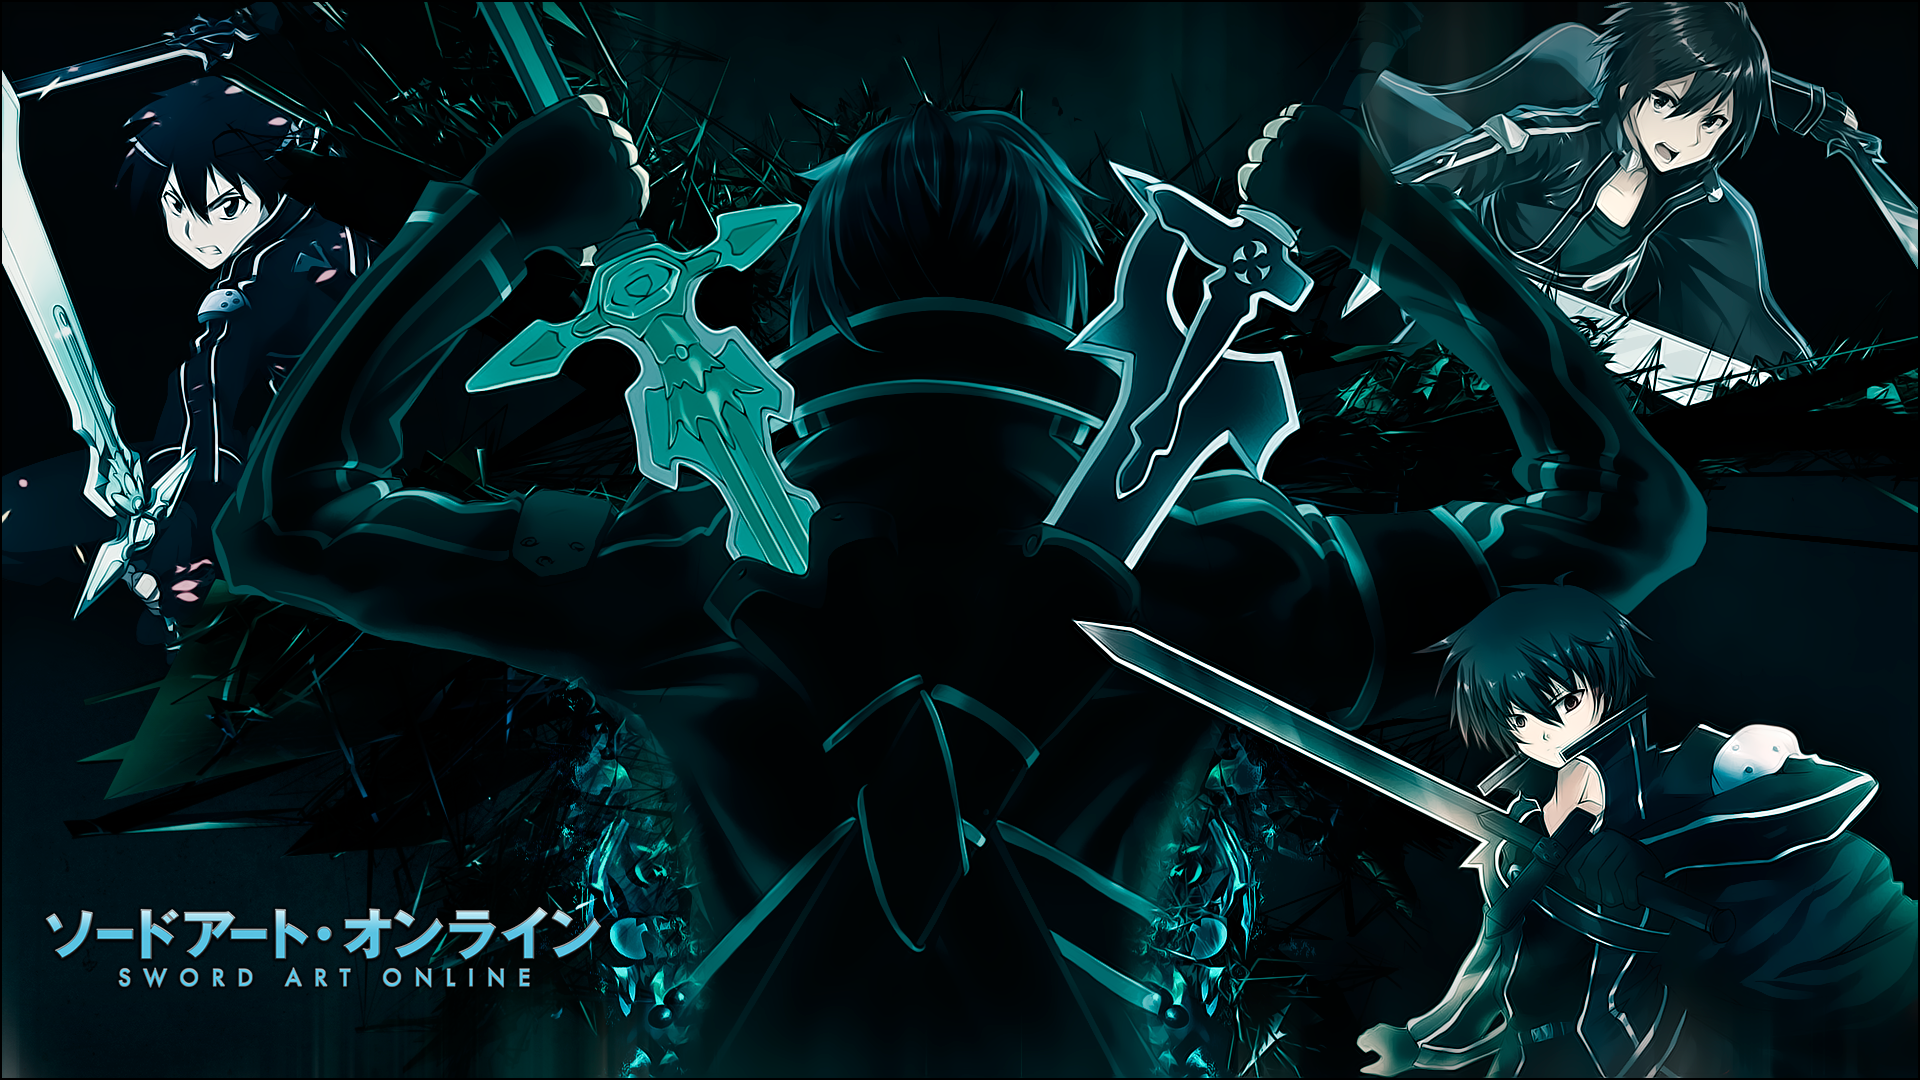 sao wallpaper - google search | sword art online | pinterest | sword